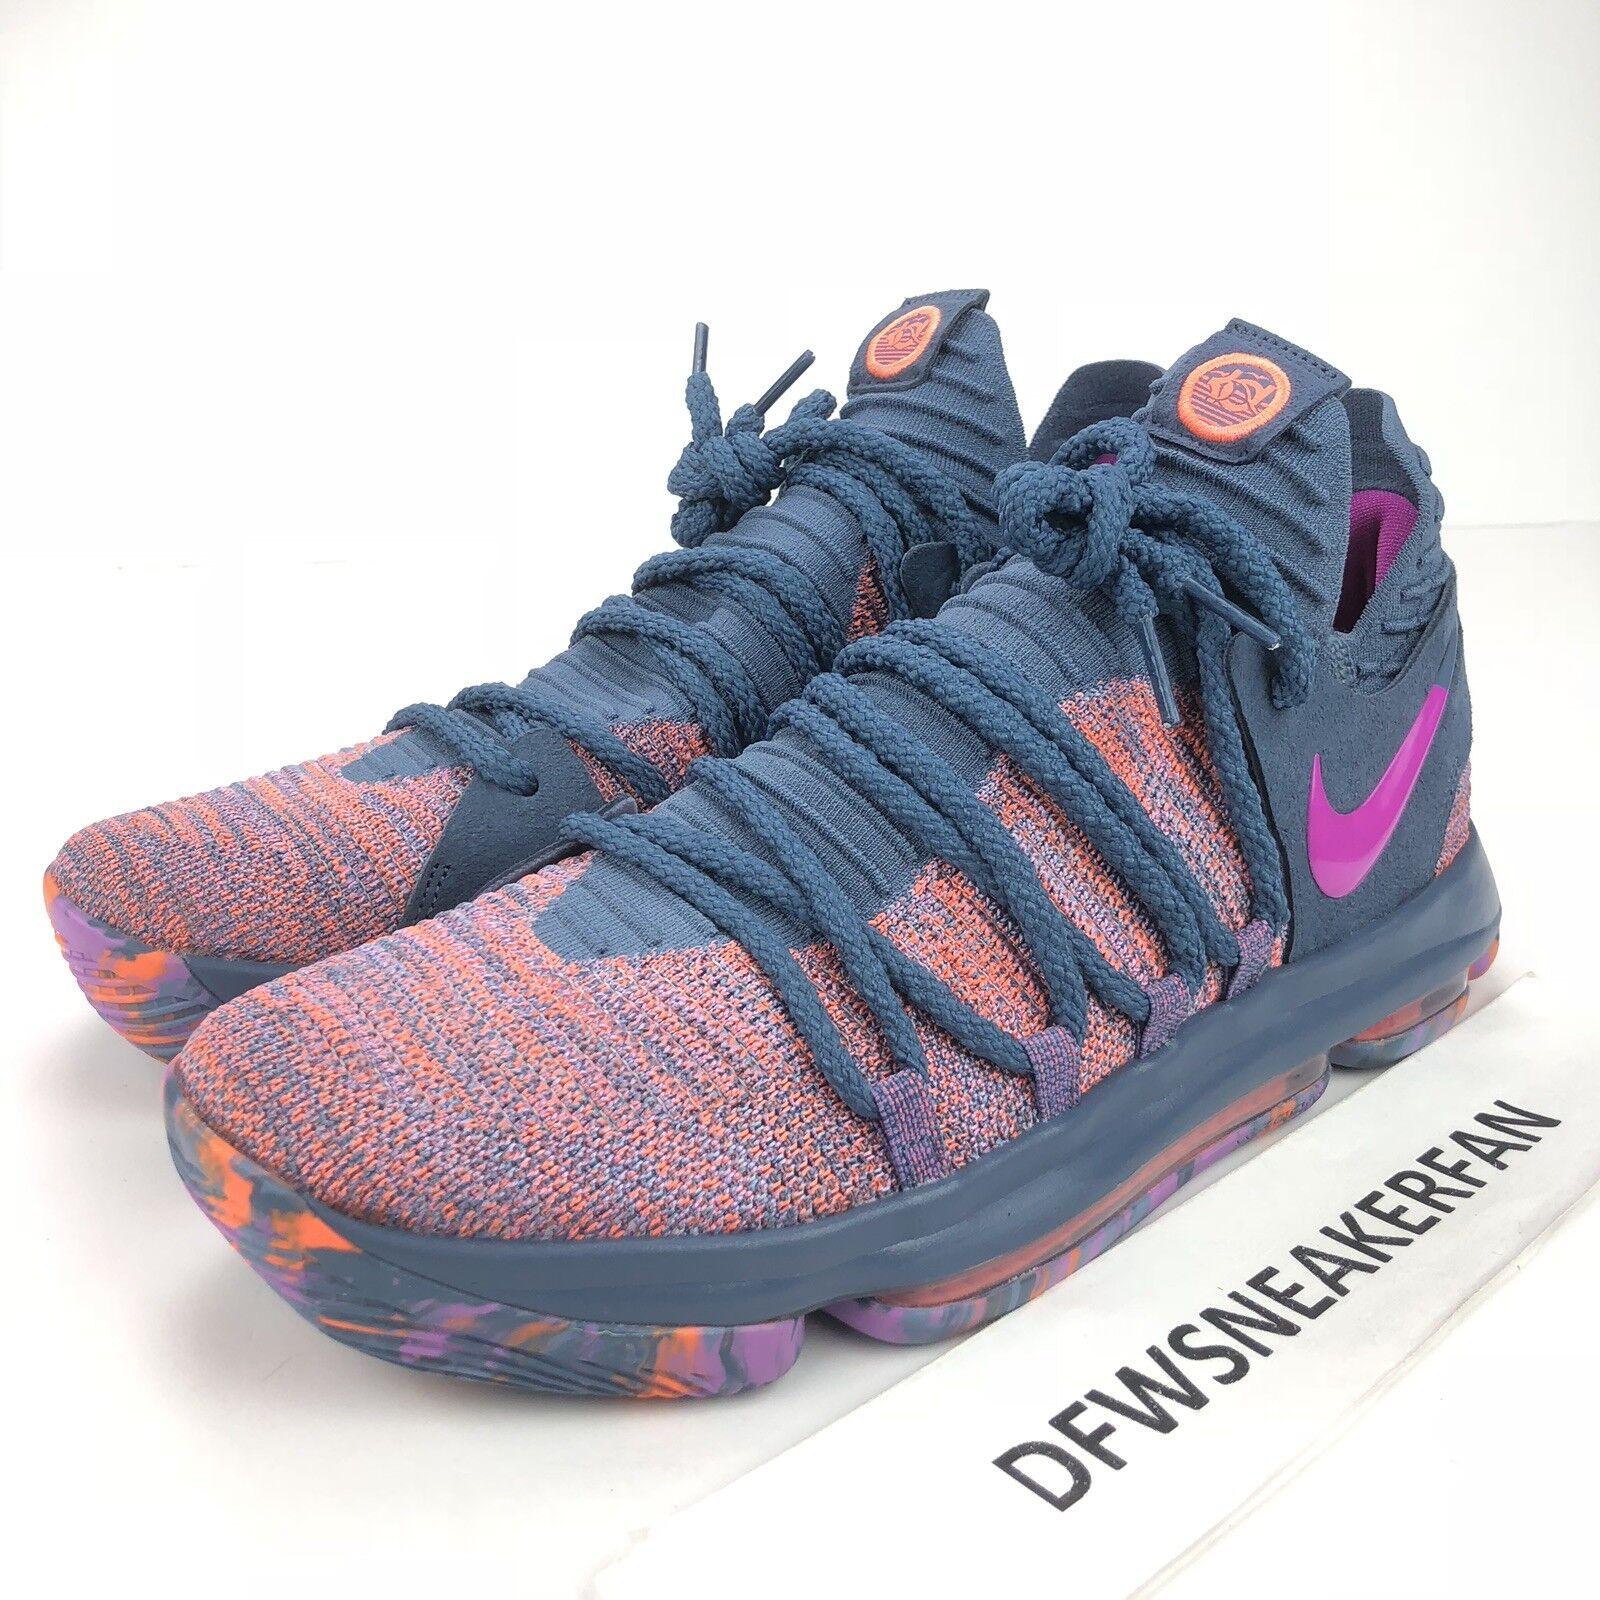 a820344cadd2ed Nike Zoom KD10 Lmtd Herren Größe UK 11 All-Star All-Star All-Star Ozean  Nebel Fuchsien 897817-400 8a35ba